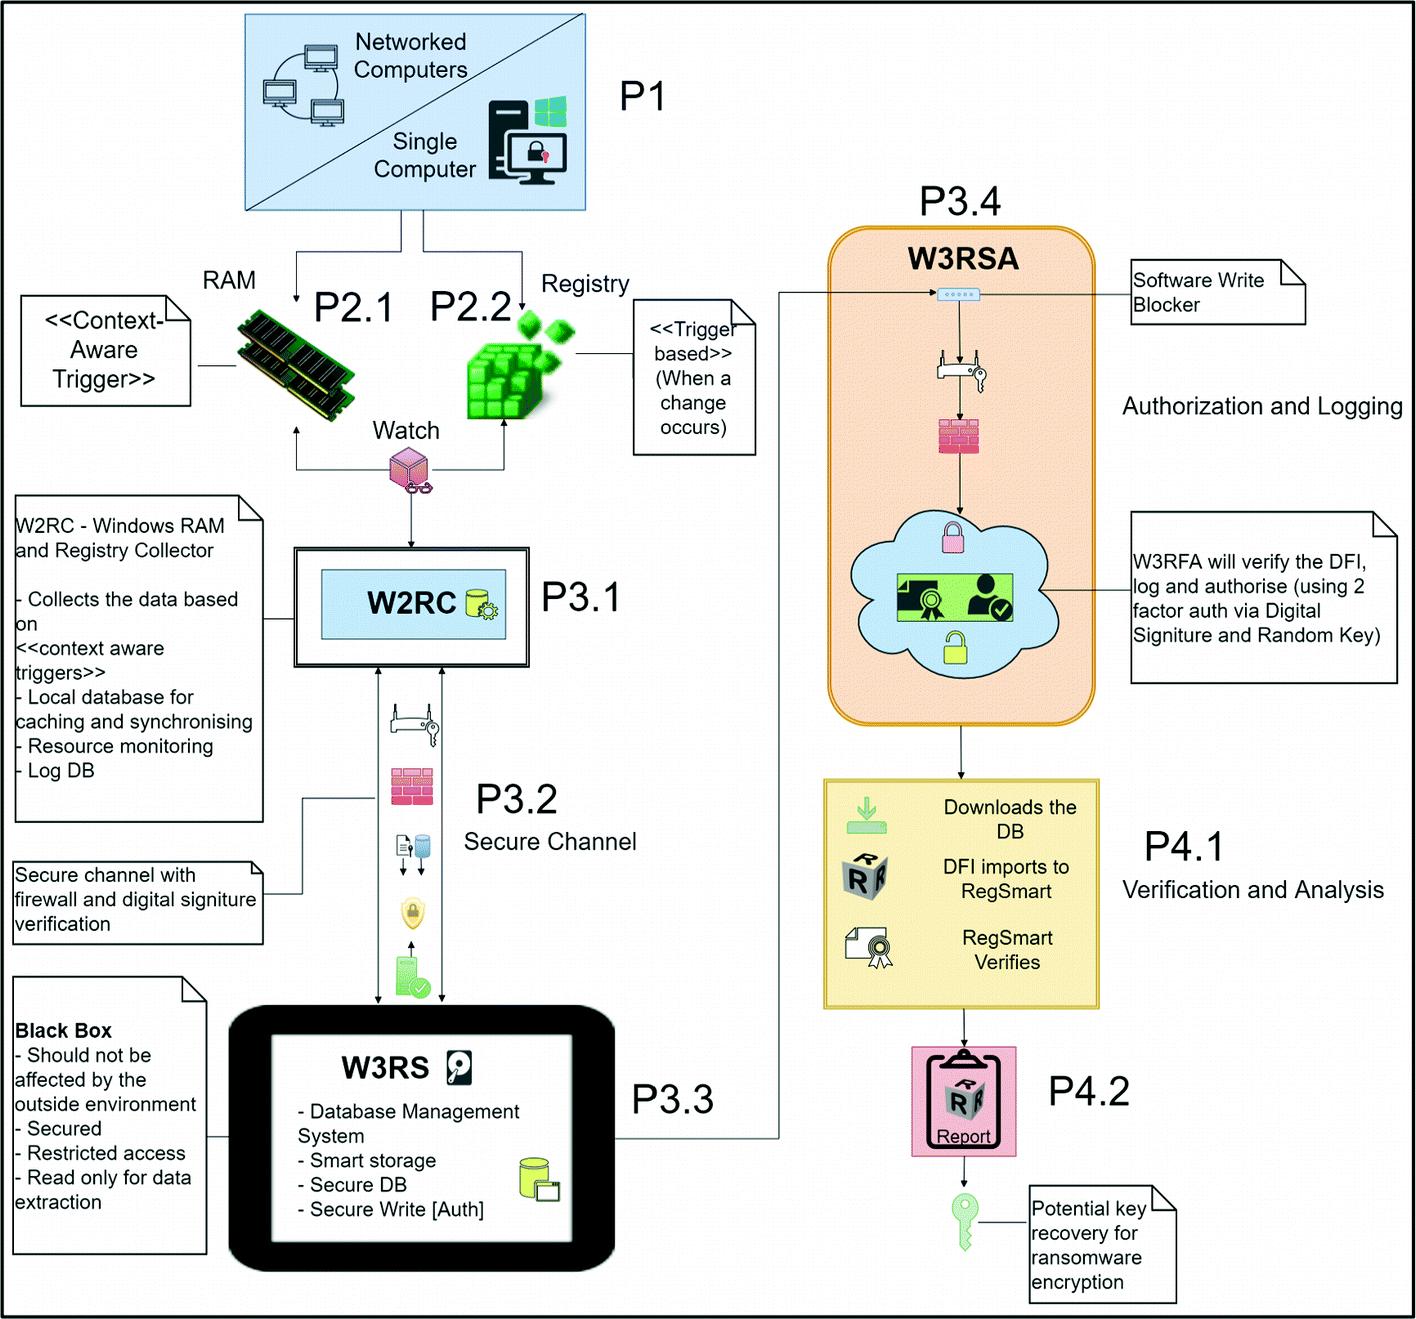 Digital Forensic Readiness Framework for Ransomware Investigation